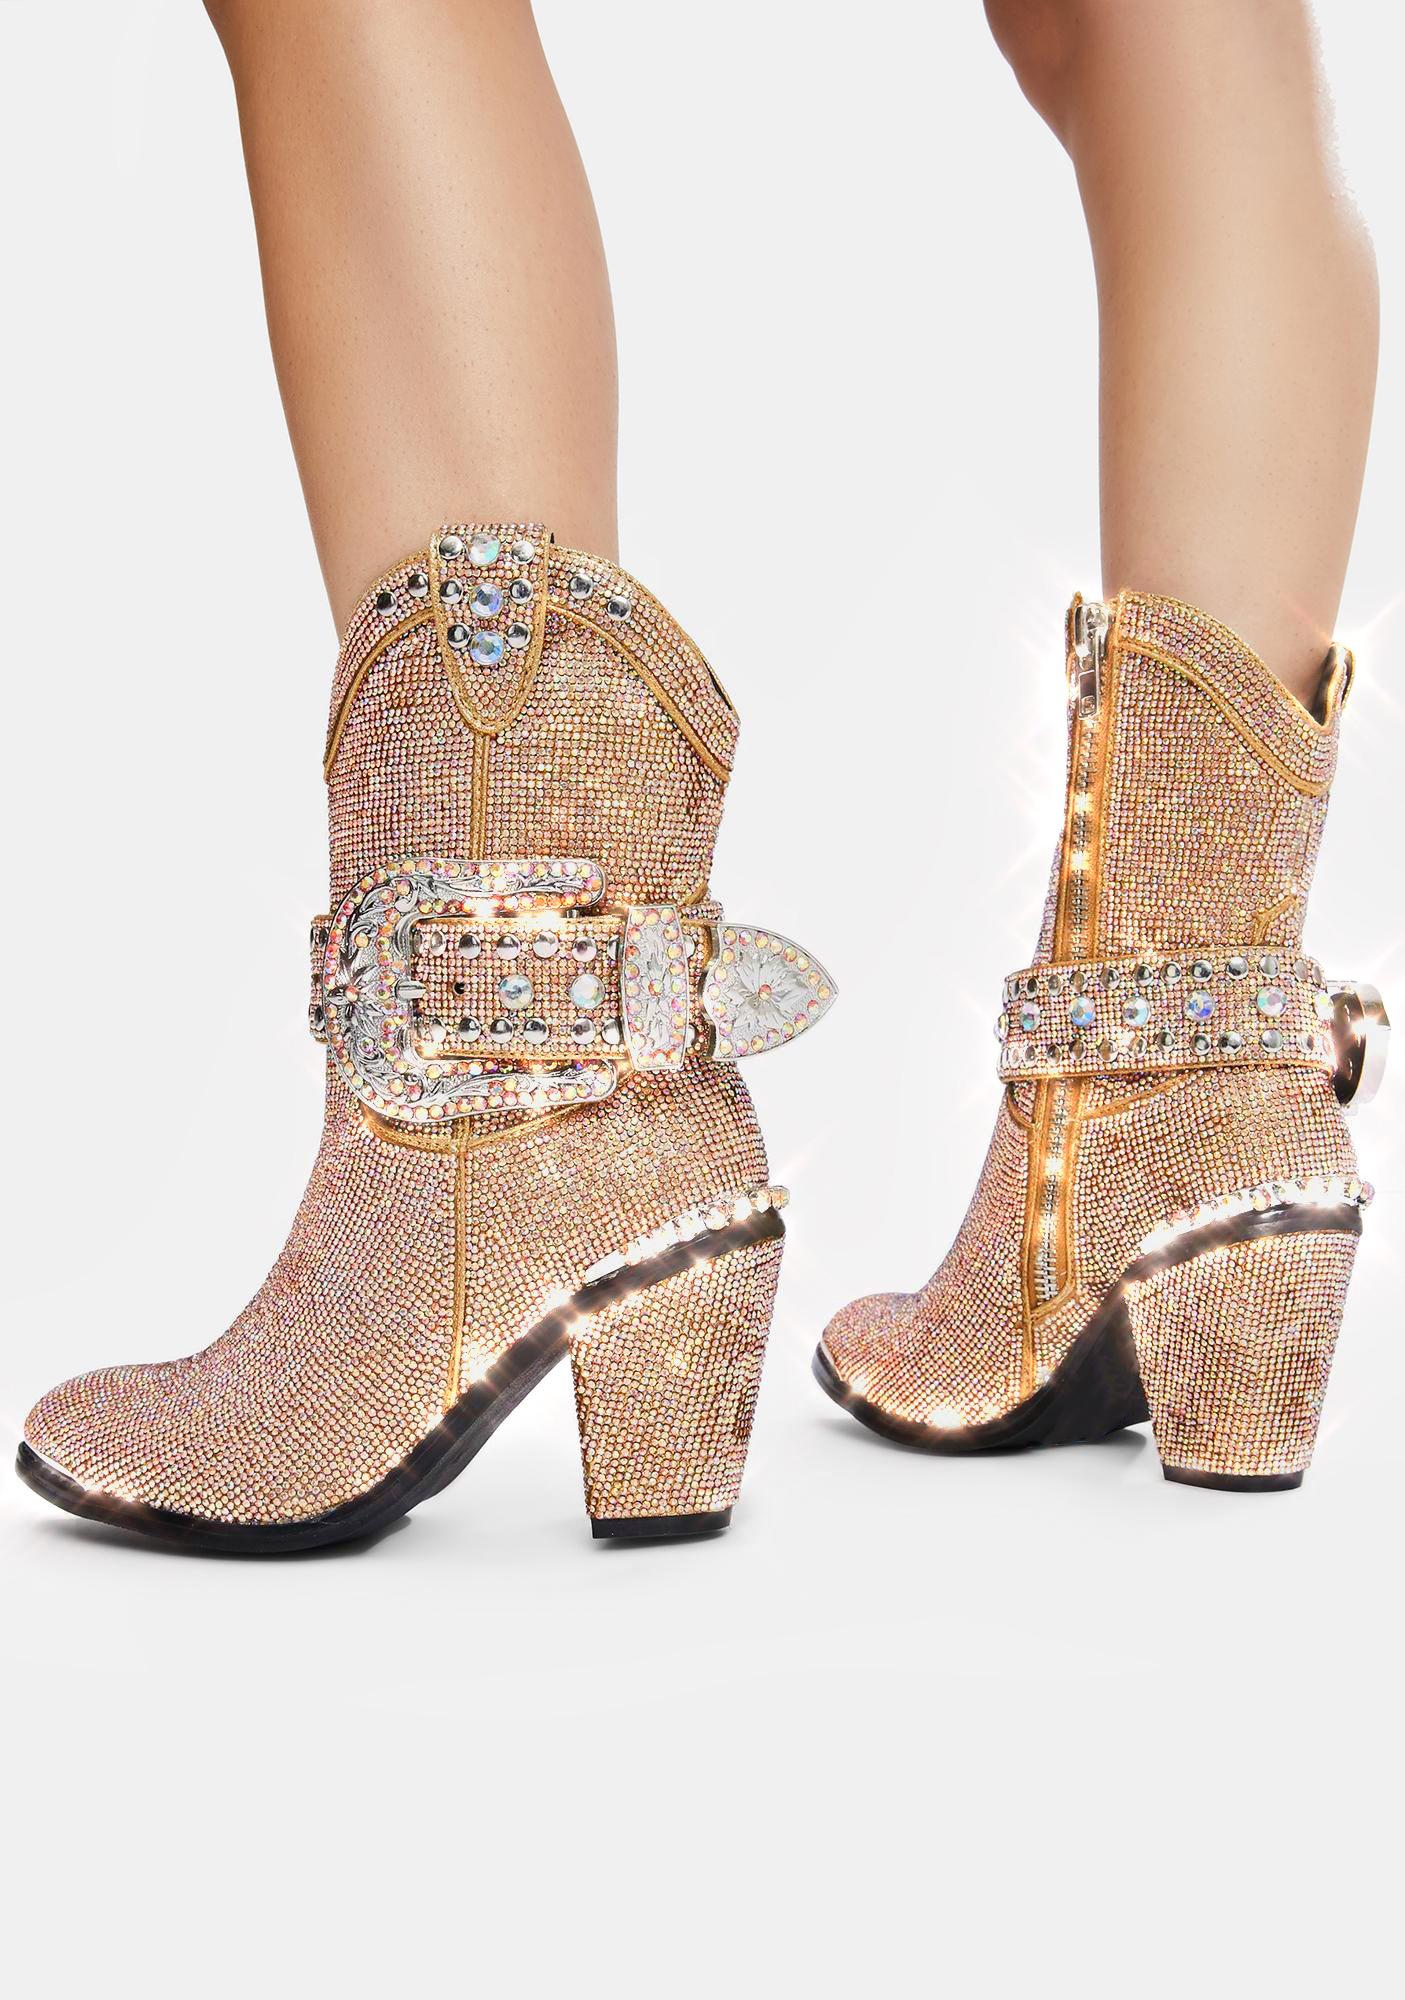 Details about  /34//45 Women Gold//Silver//Black Punk Knee High Riding Boots Cowboy Shoes Winter D